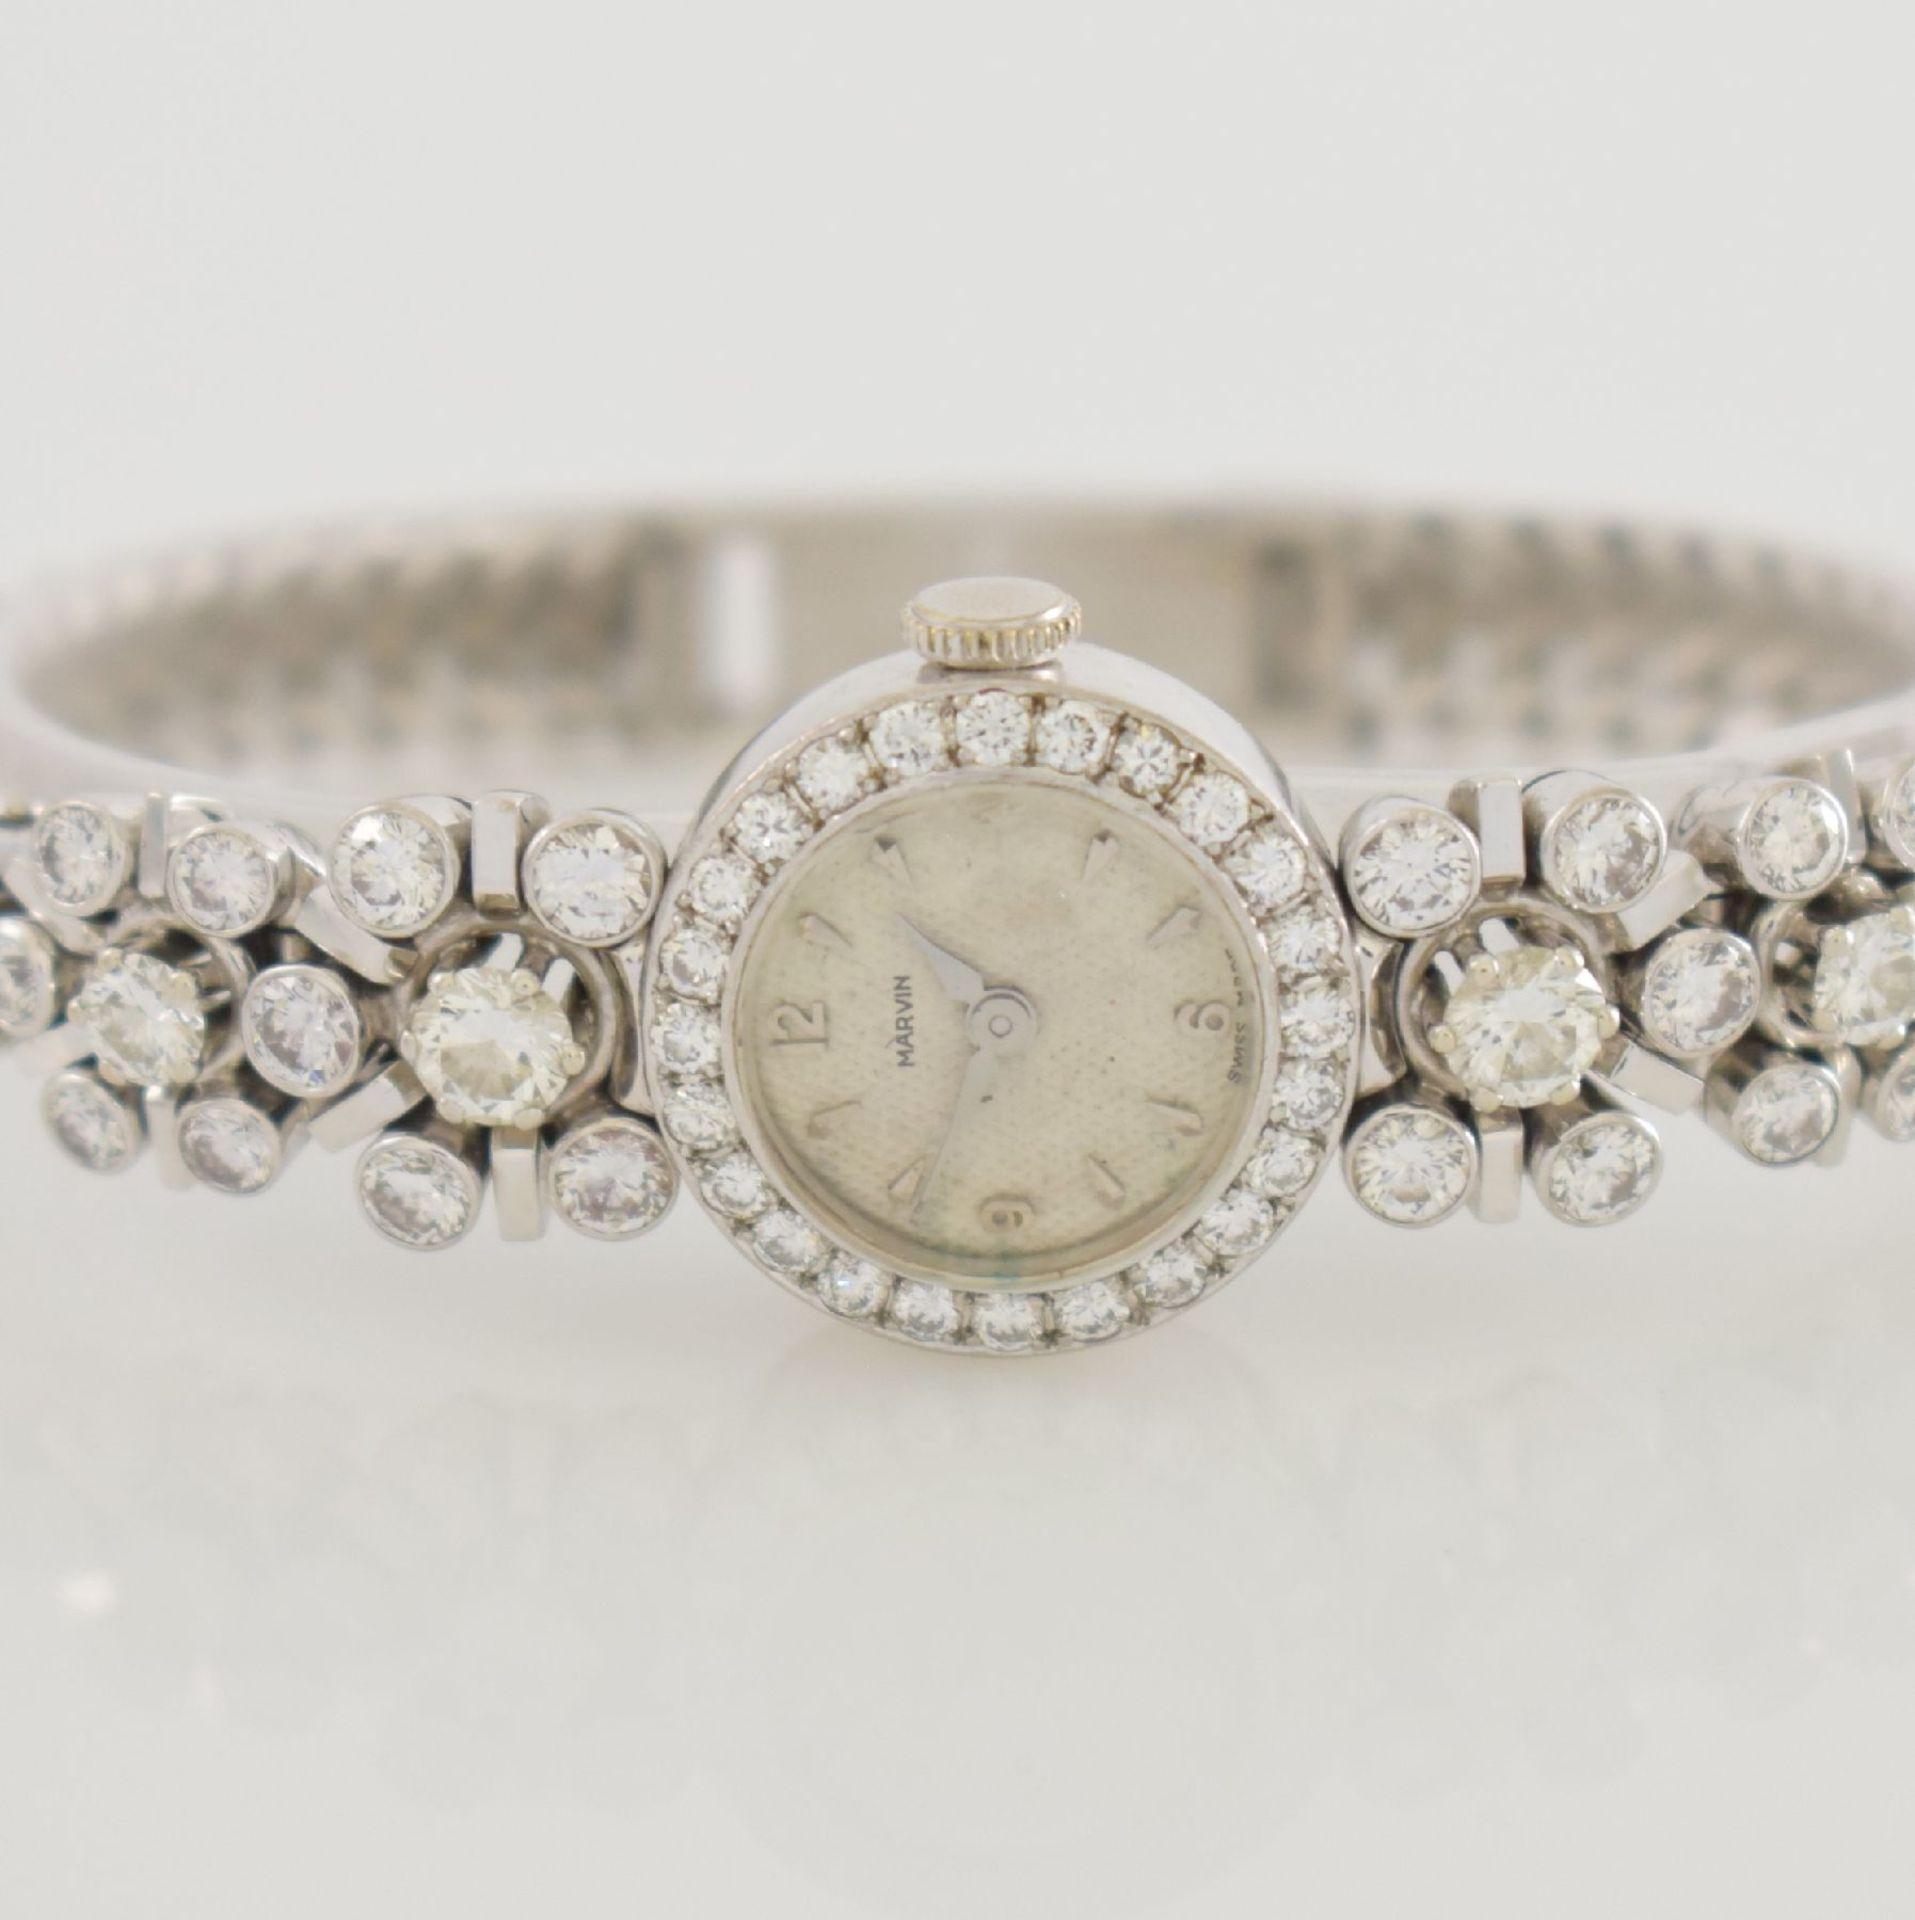 MARVIN Art Deco ausgefallene Damenarmbanduhr in WG 585/000 m. Diamanten zus. ca. 2,50 ct, Schweiz um - Bild 2 aus 5